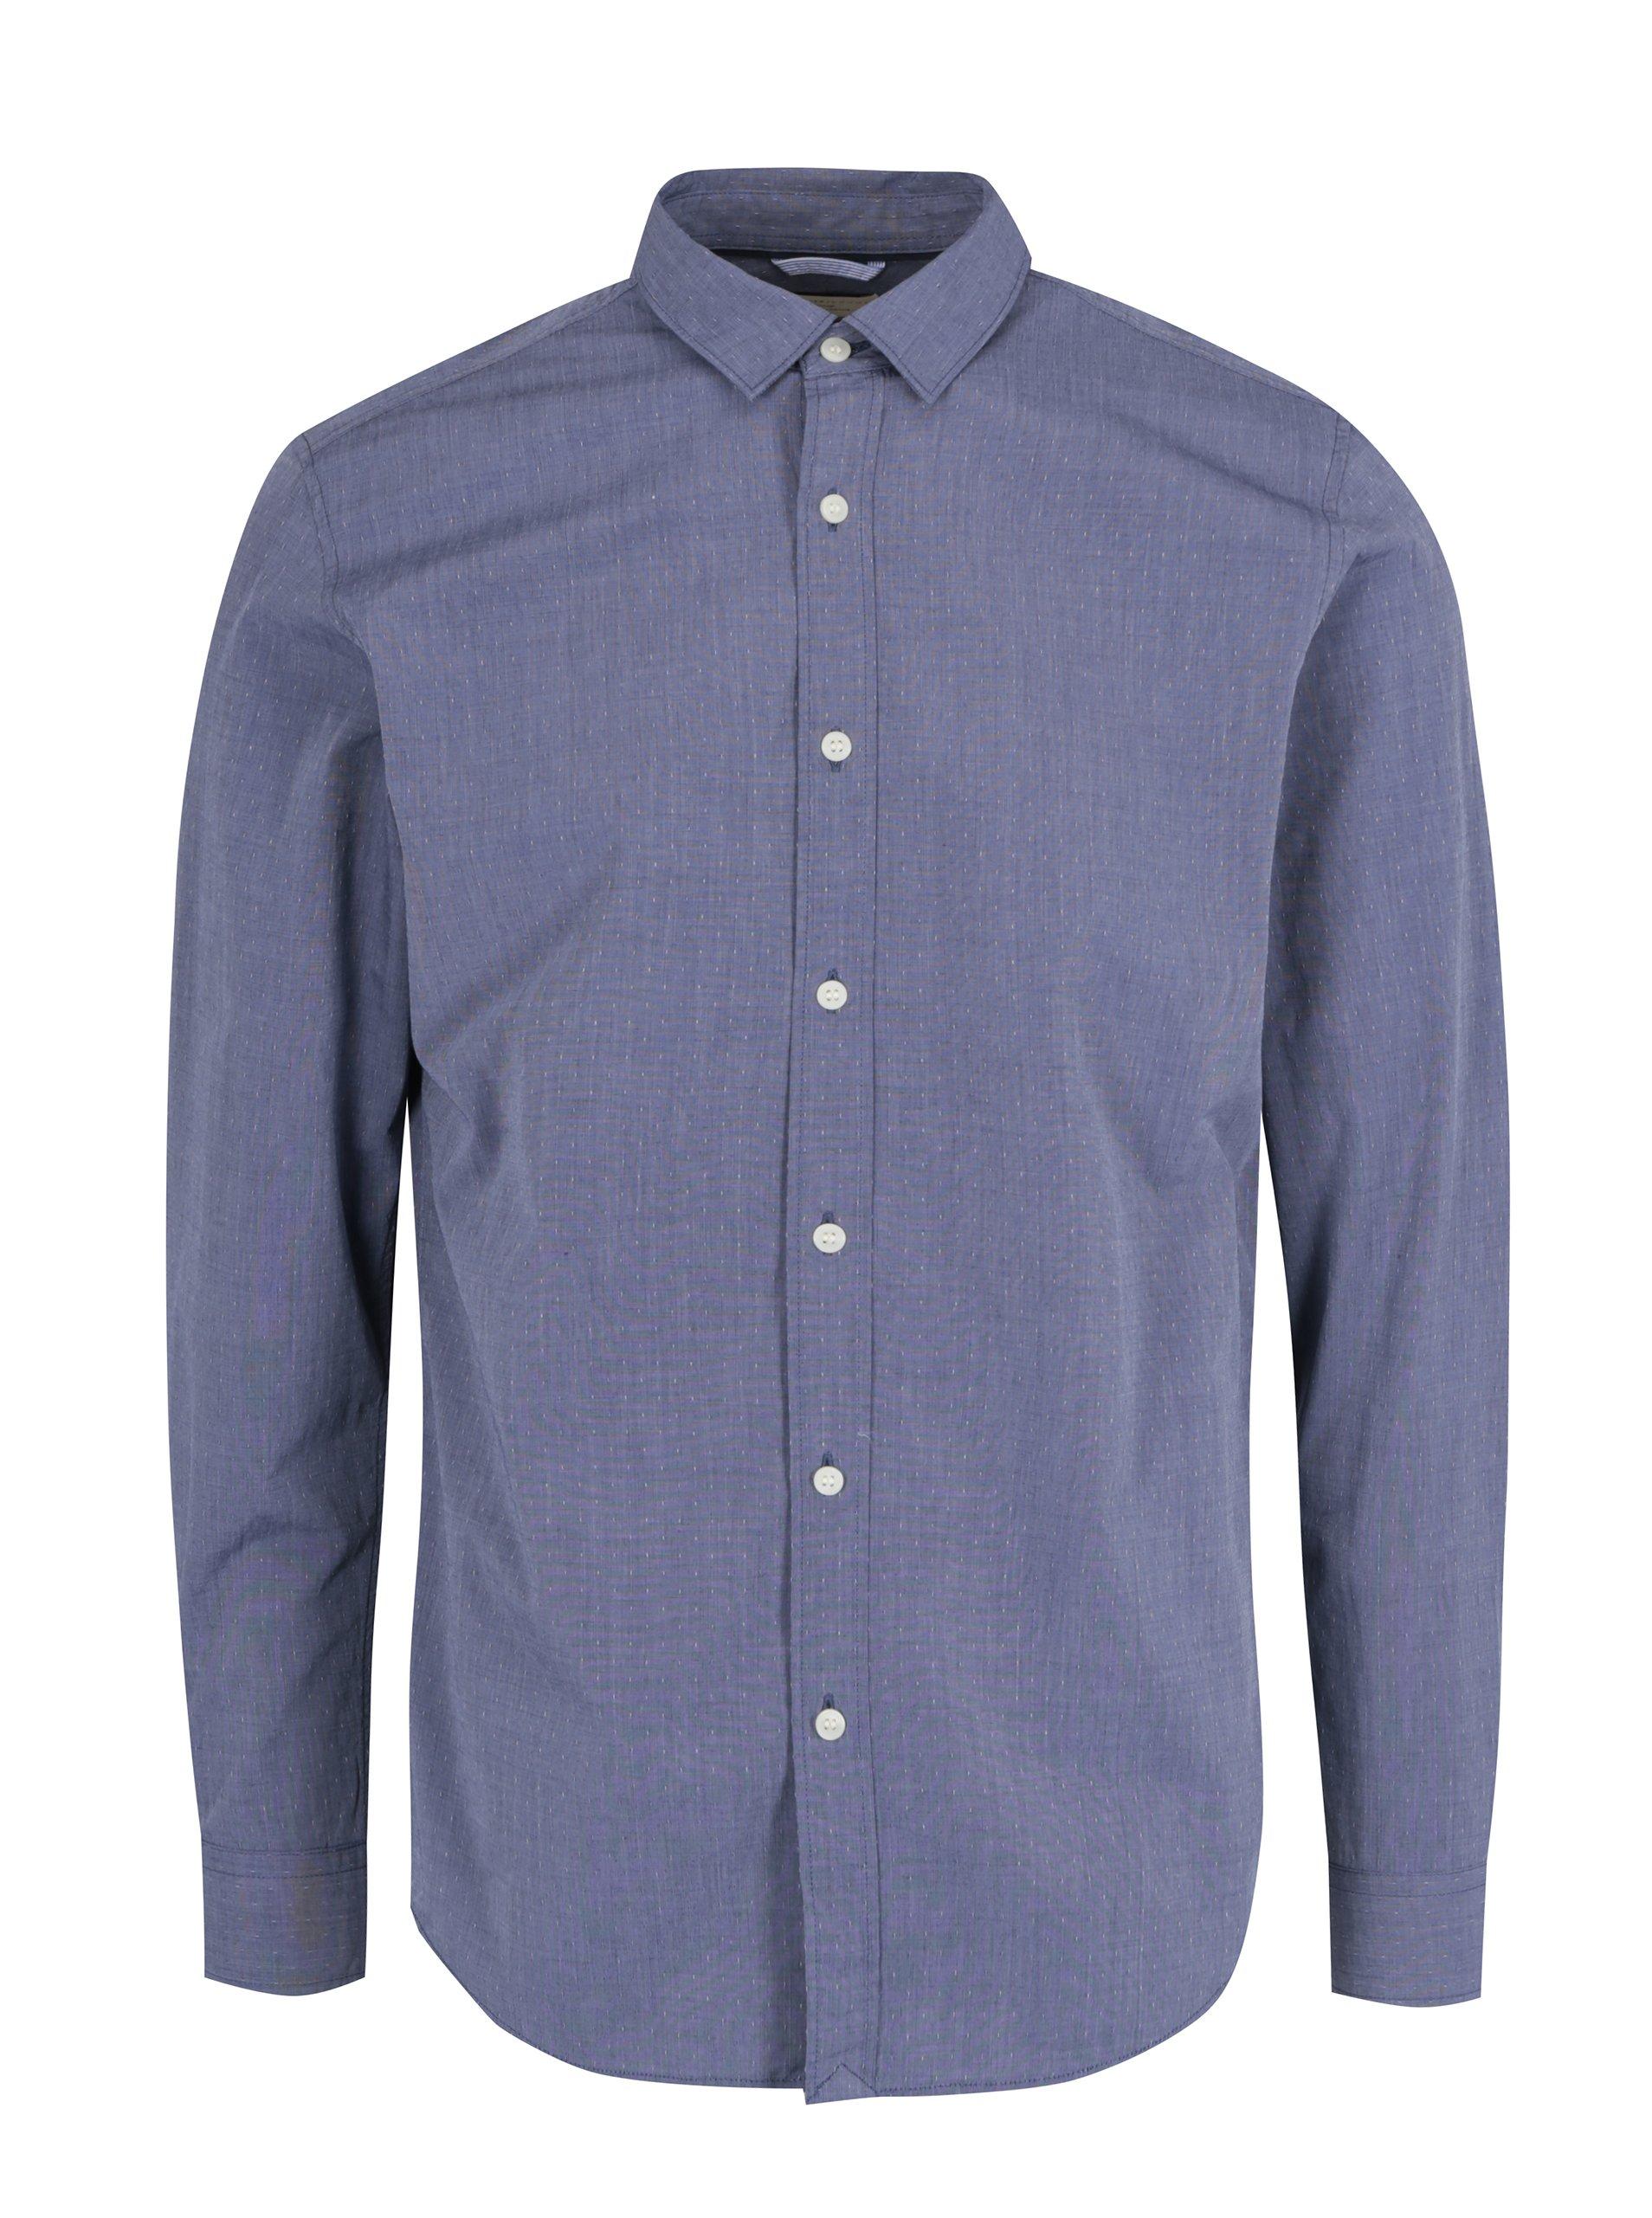 18722aa4648a Modrá formálna slim fit košeľa Selected Homme